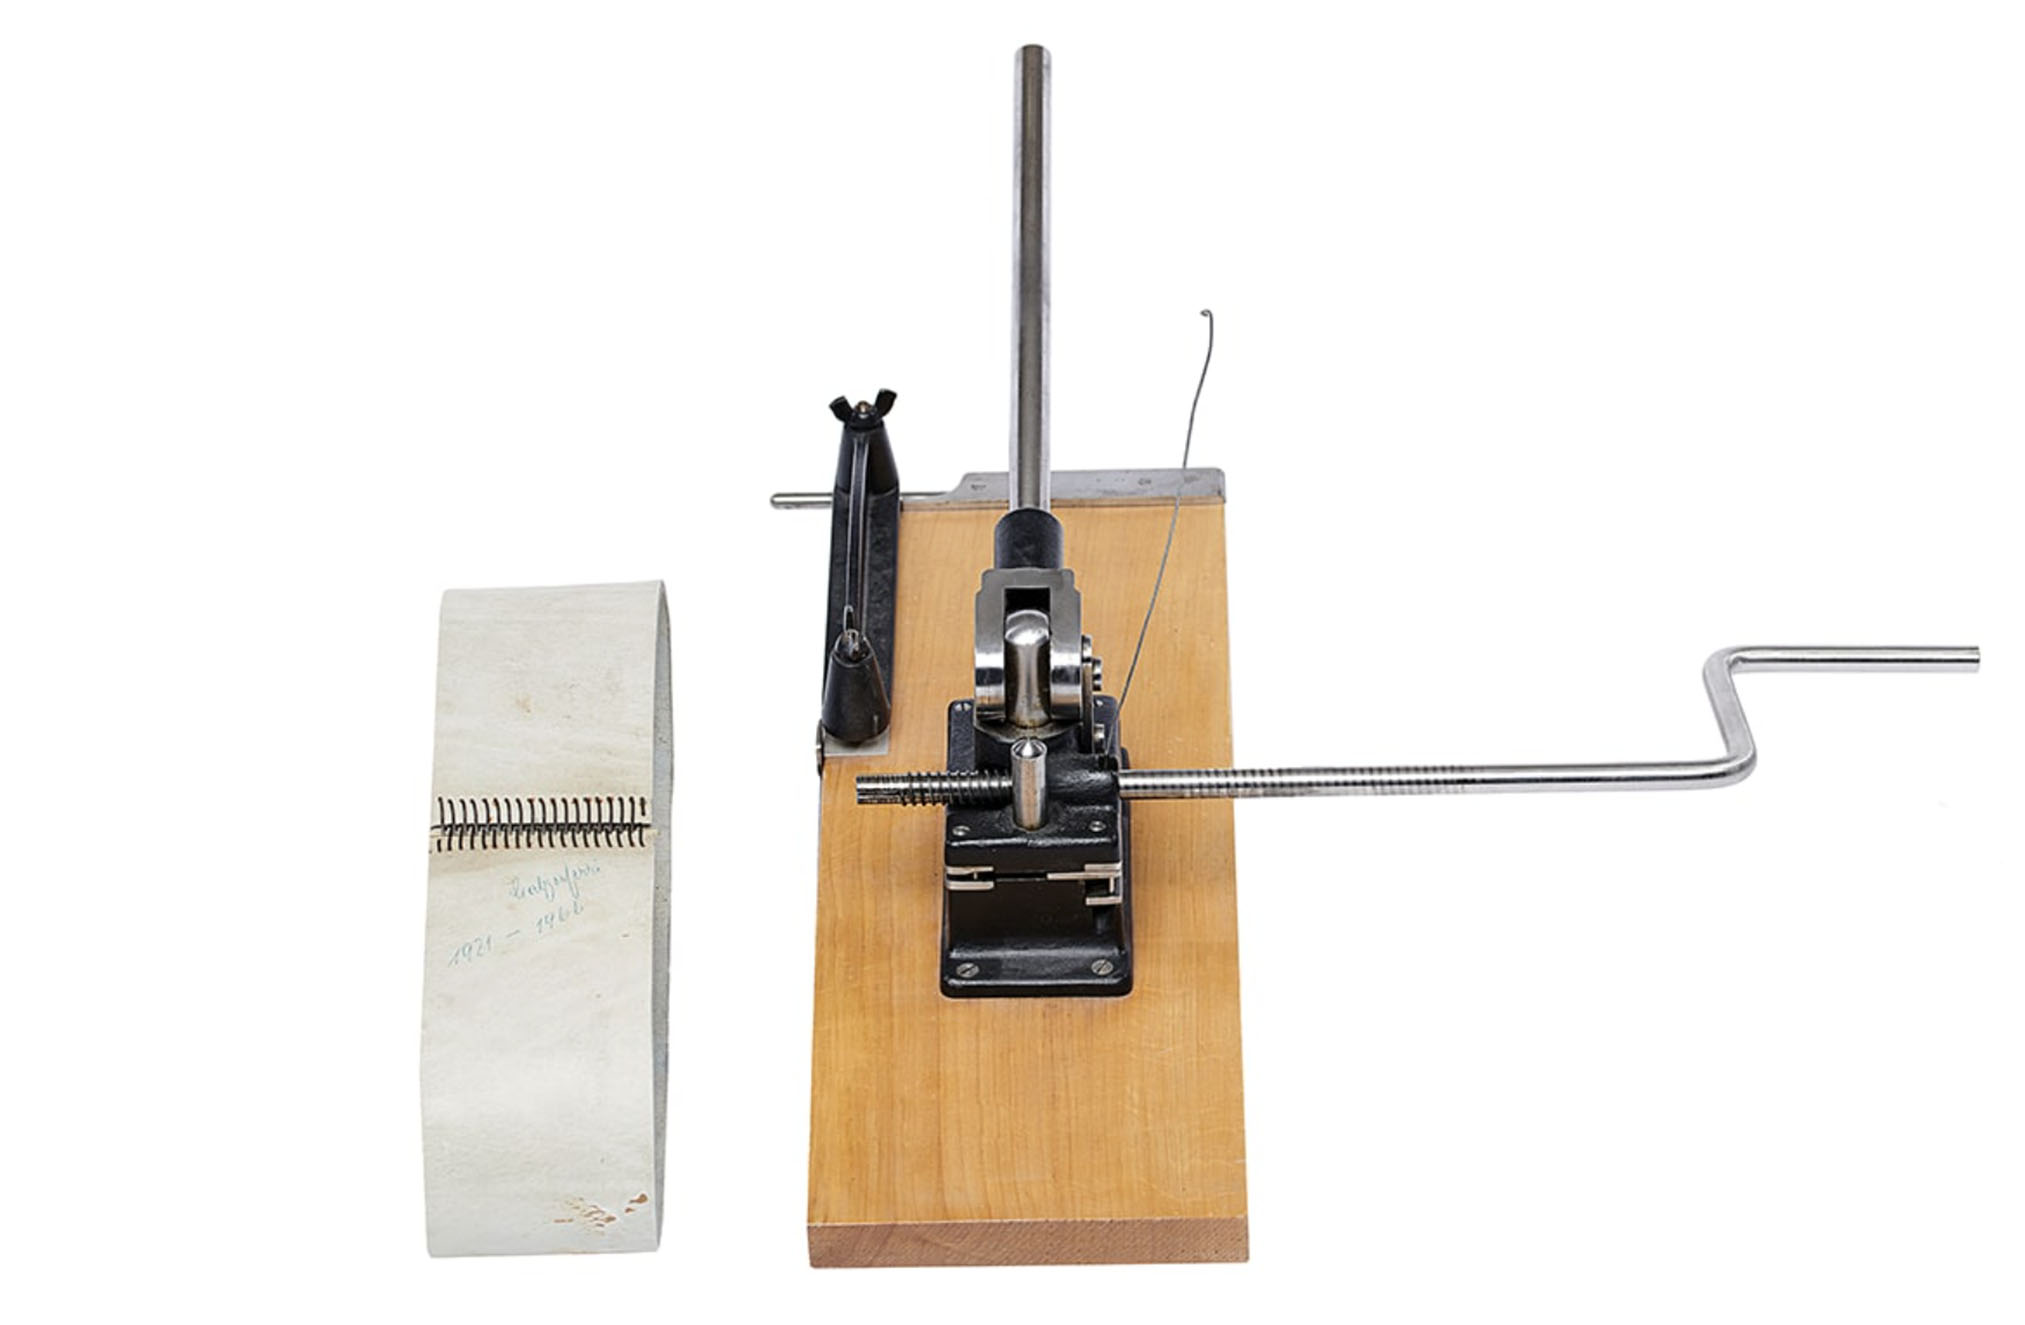 Sistema de unión para correa de transmisión. Primer producto de Braun. 1921